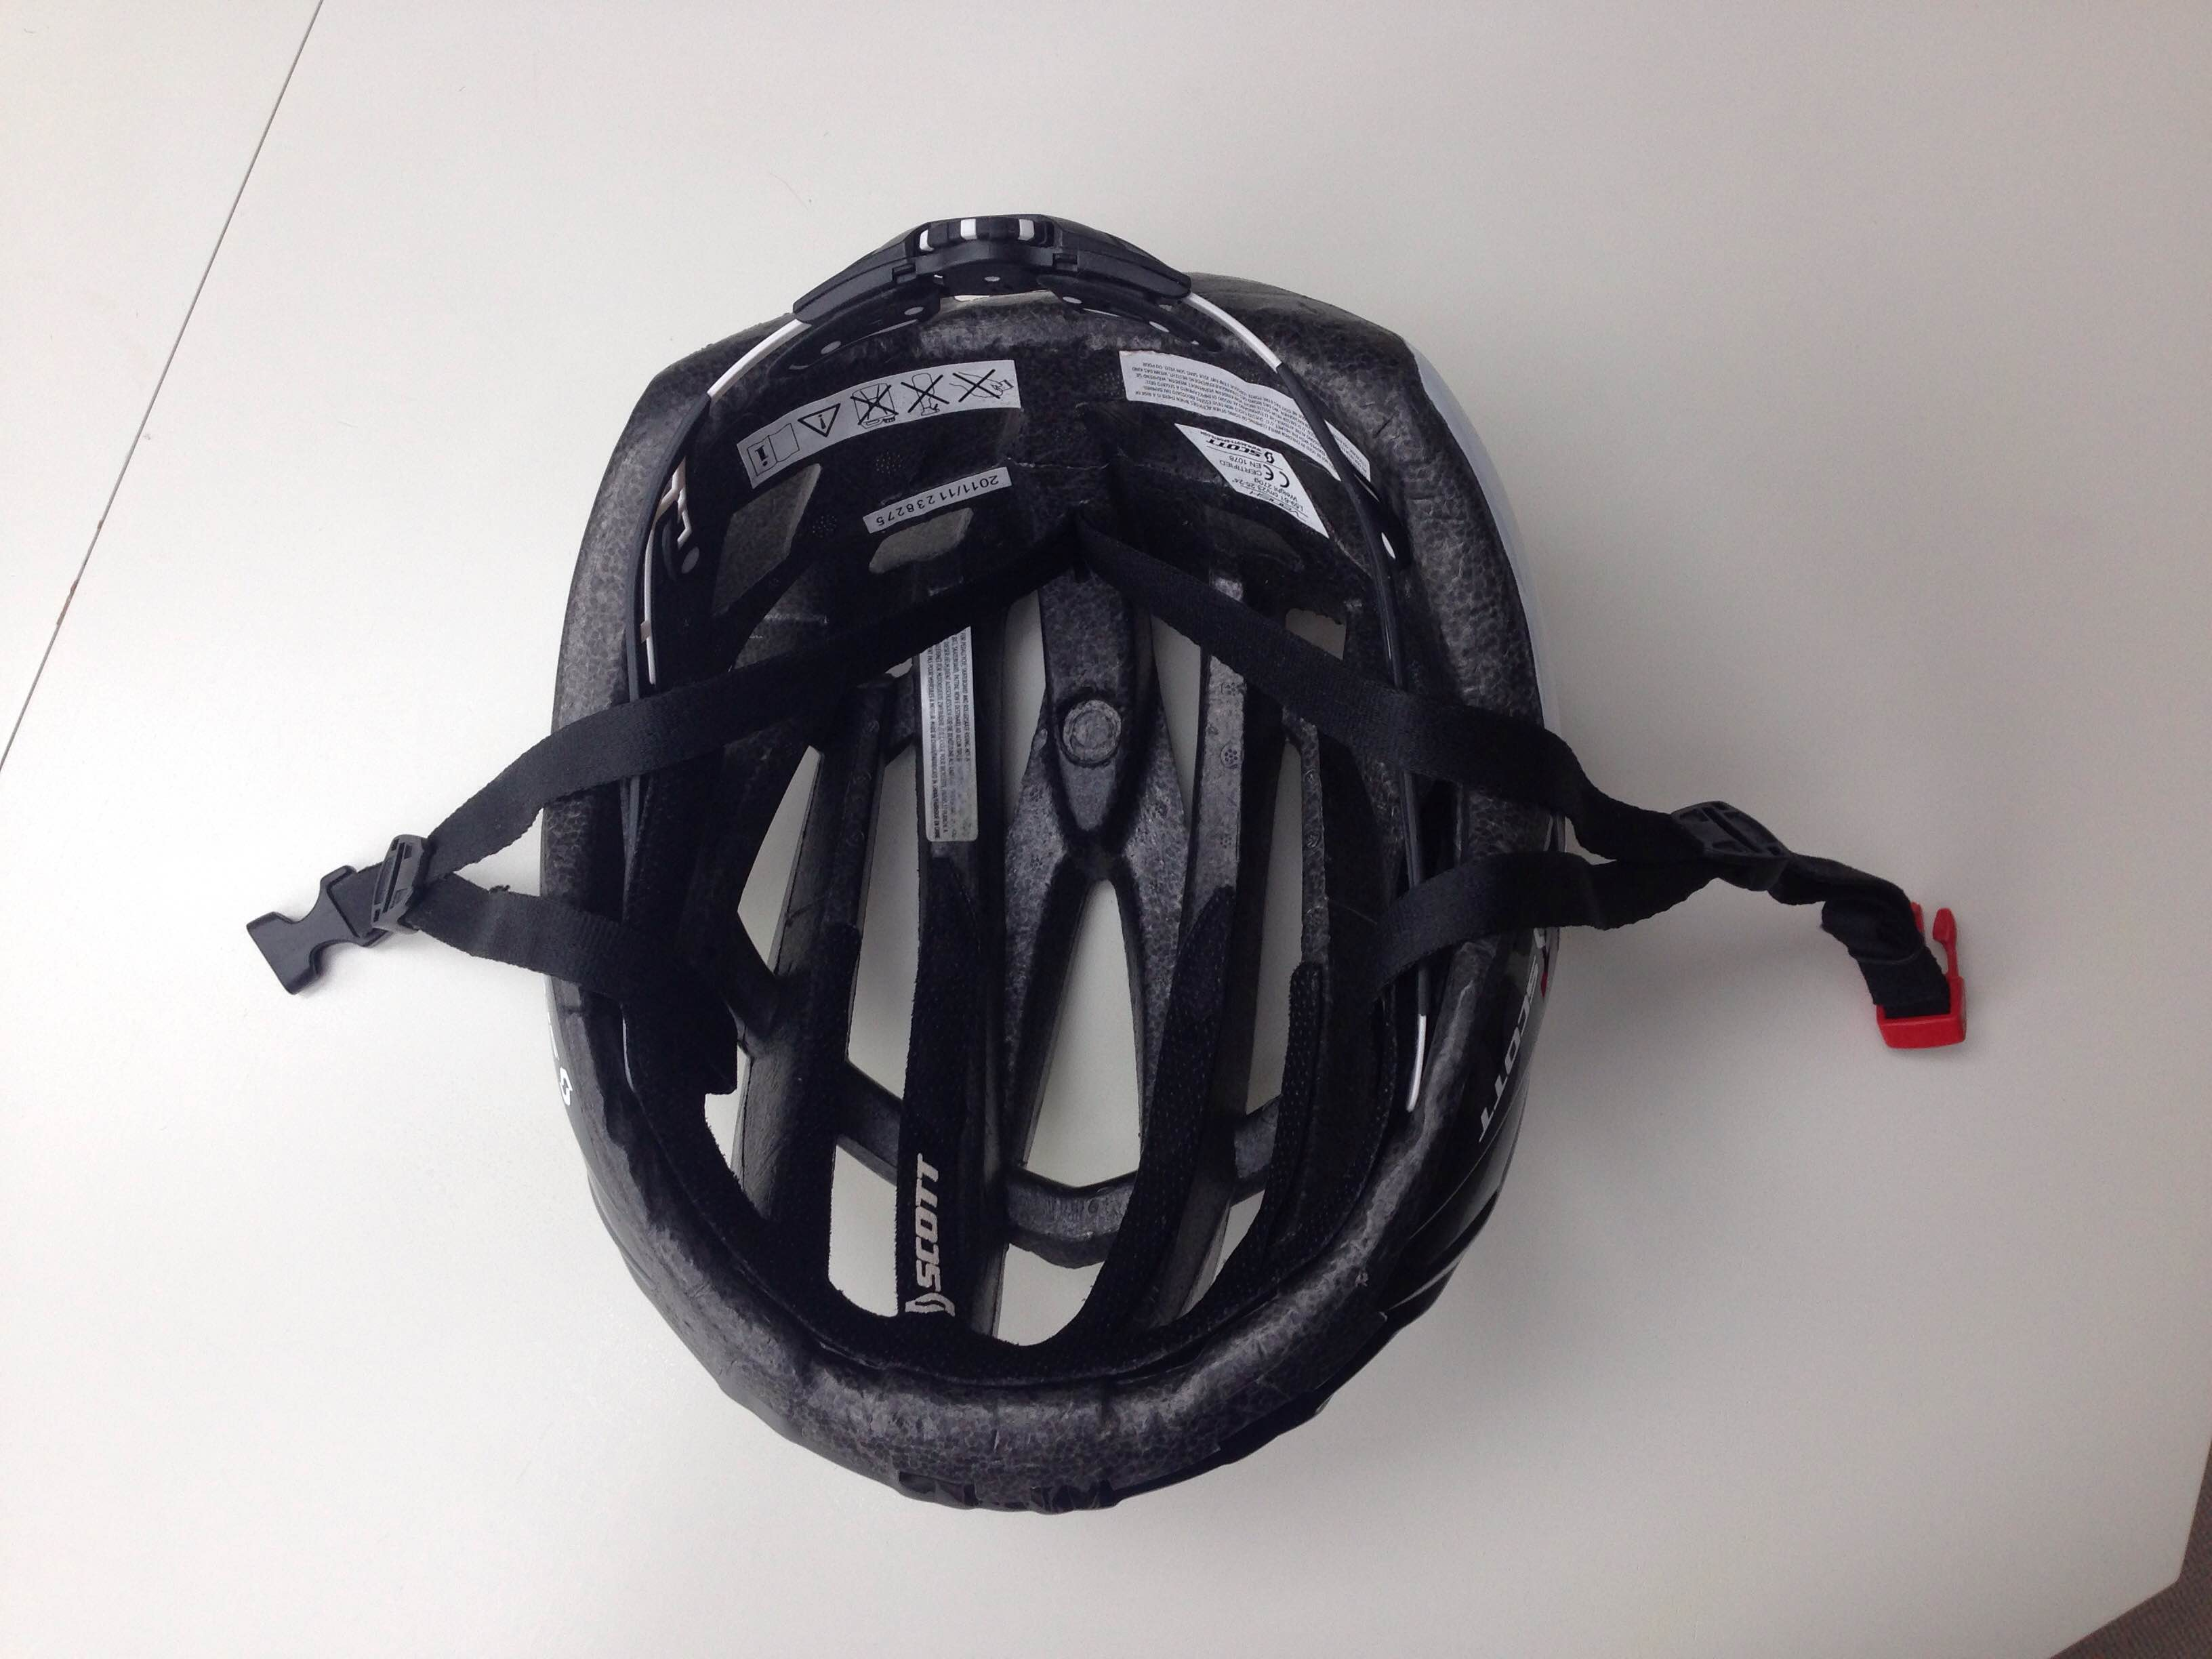 Cykelhjelm stort hoved